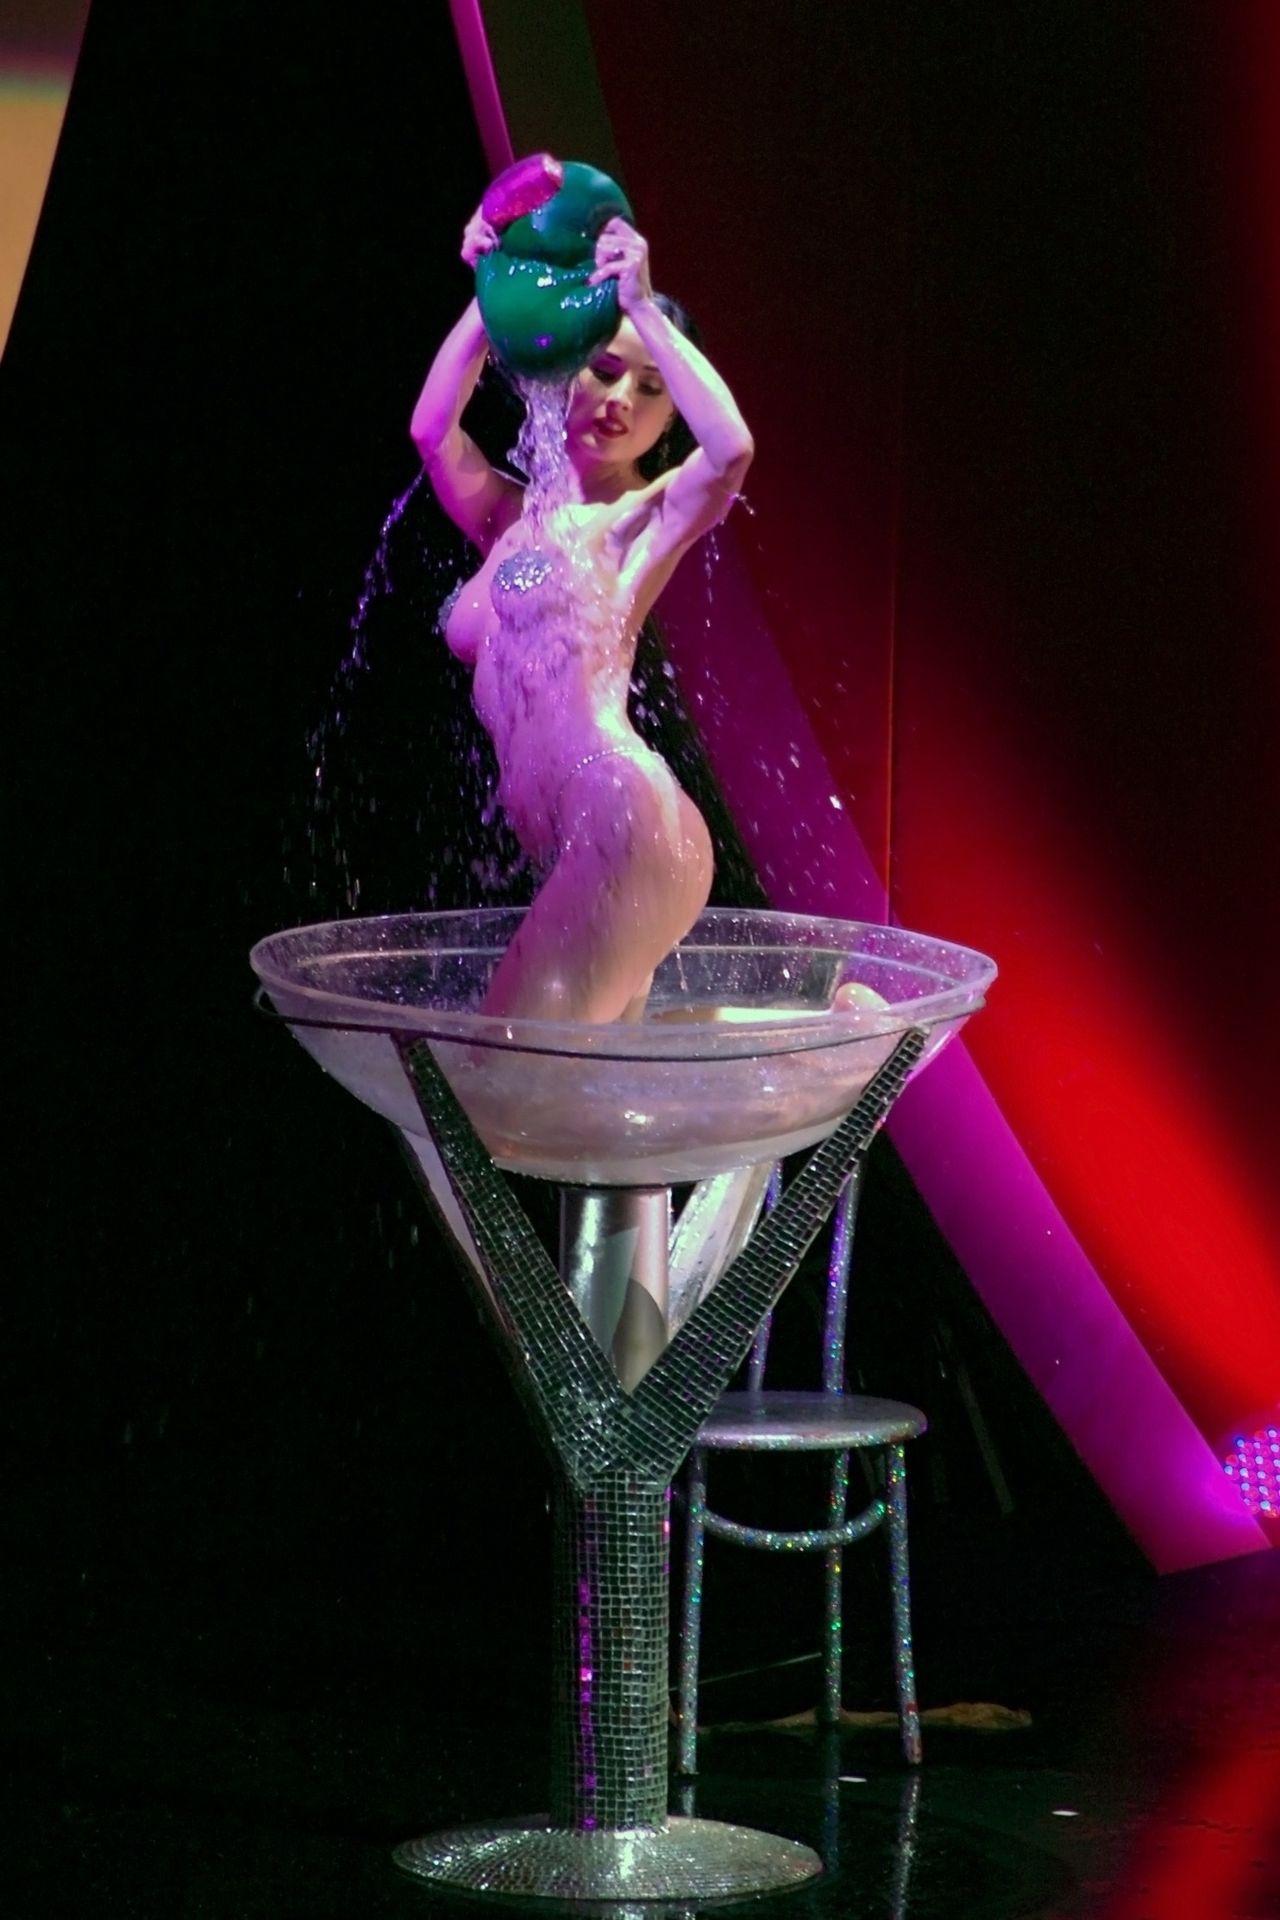 Dita Von Teese Performs At Erotica 06 In London 0041